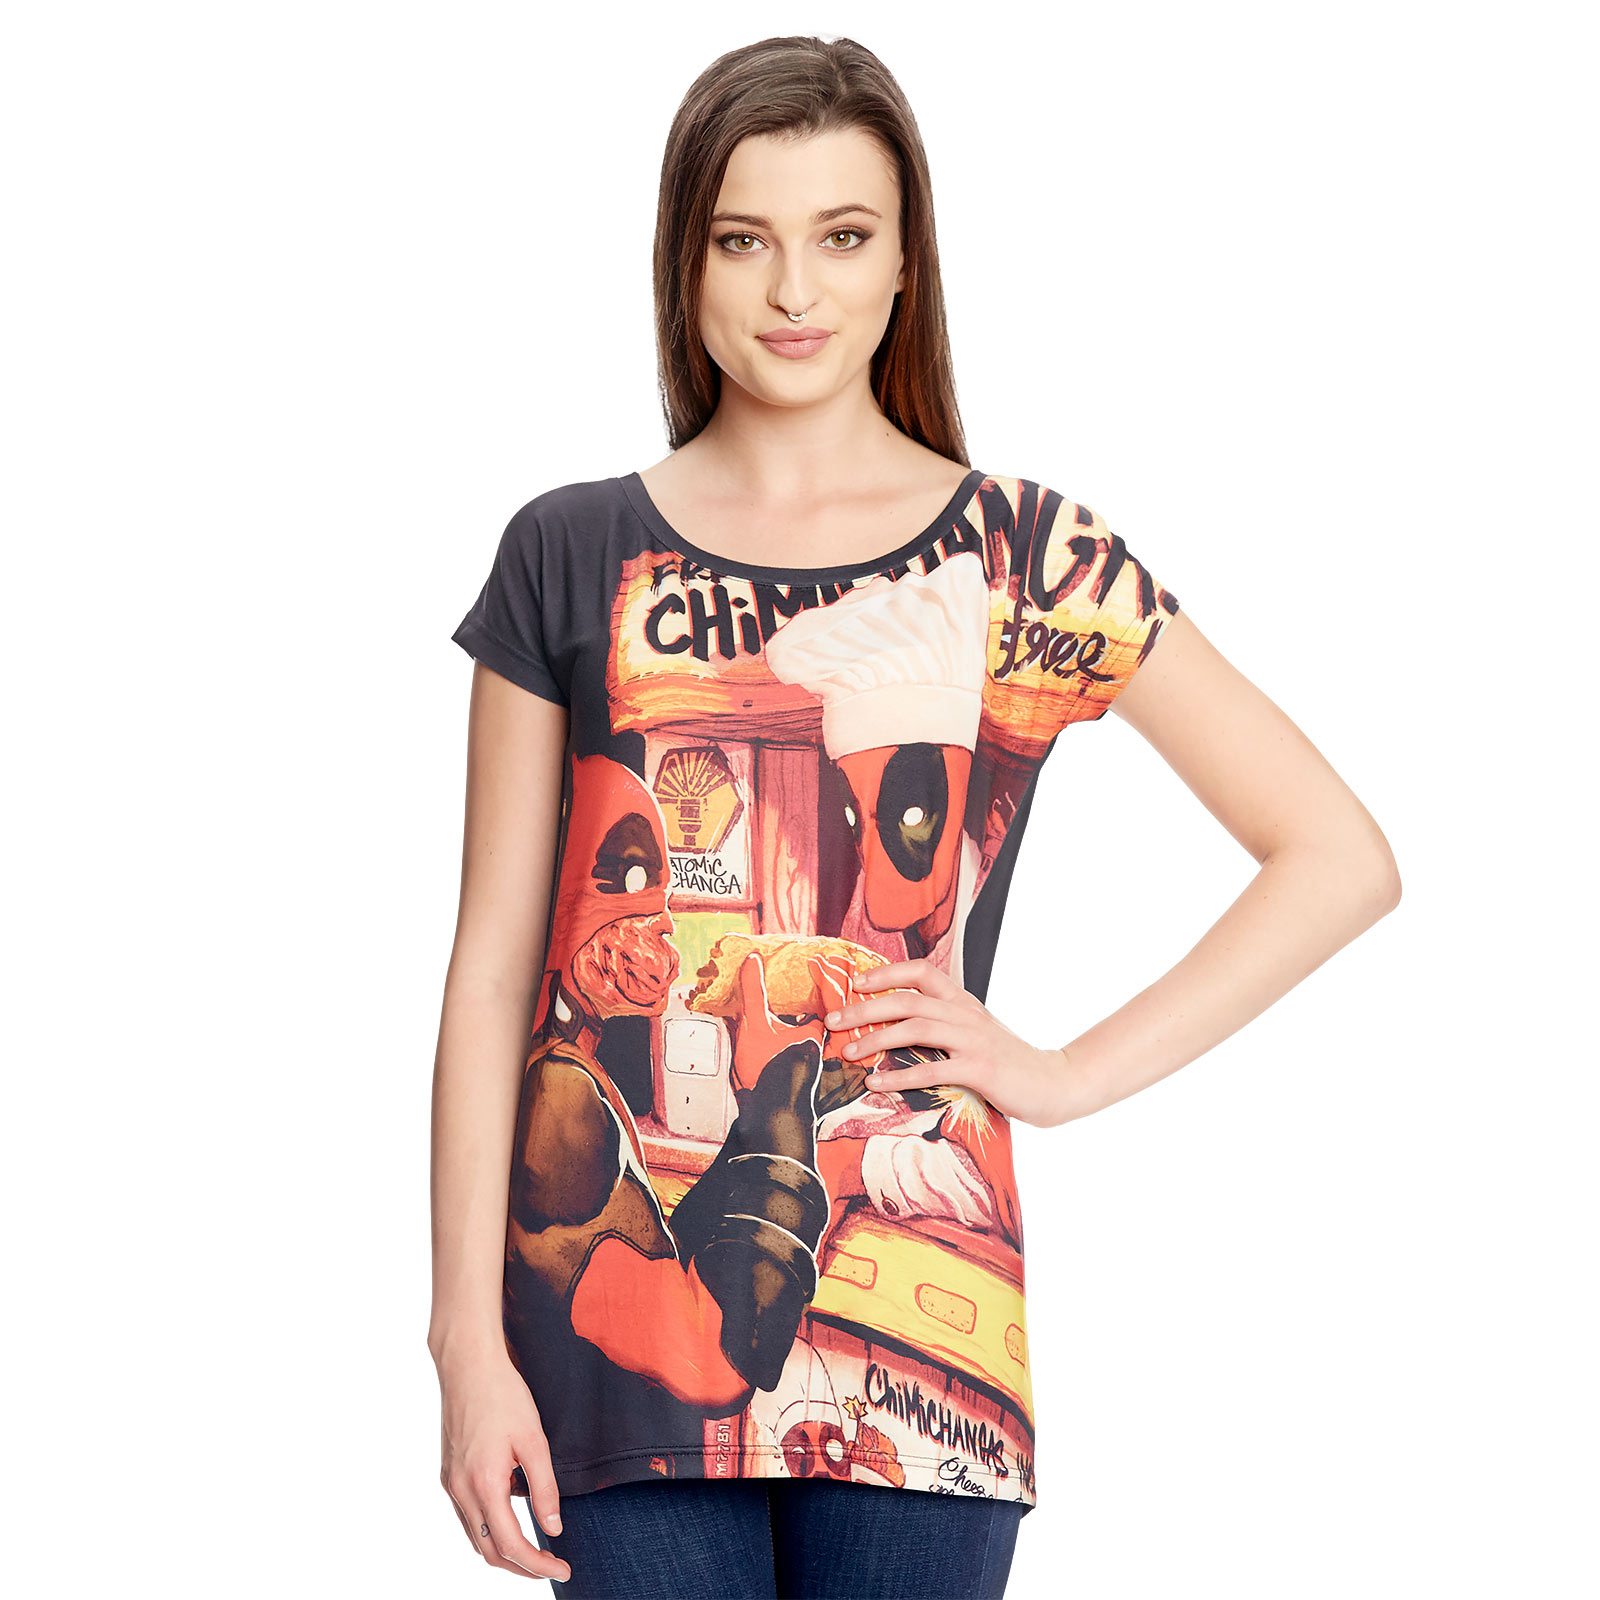 Deadpool - Chimichanga Girlie Shirt Loose Fit schwarz